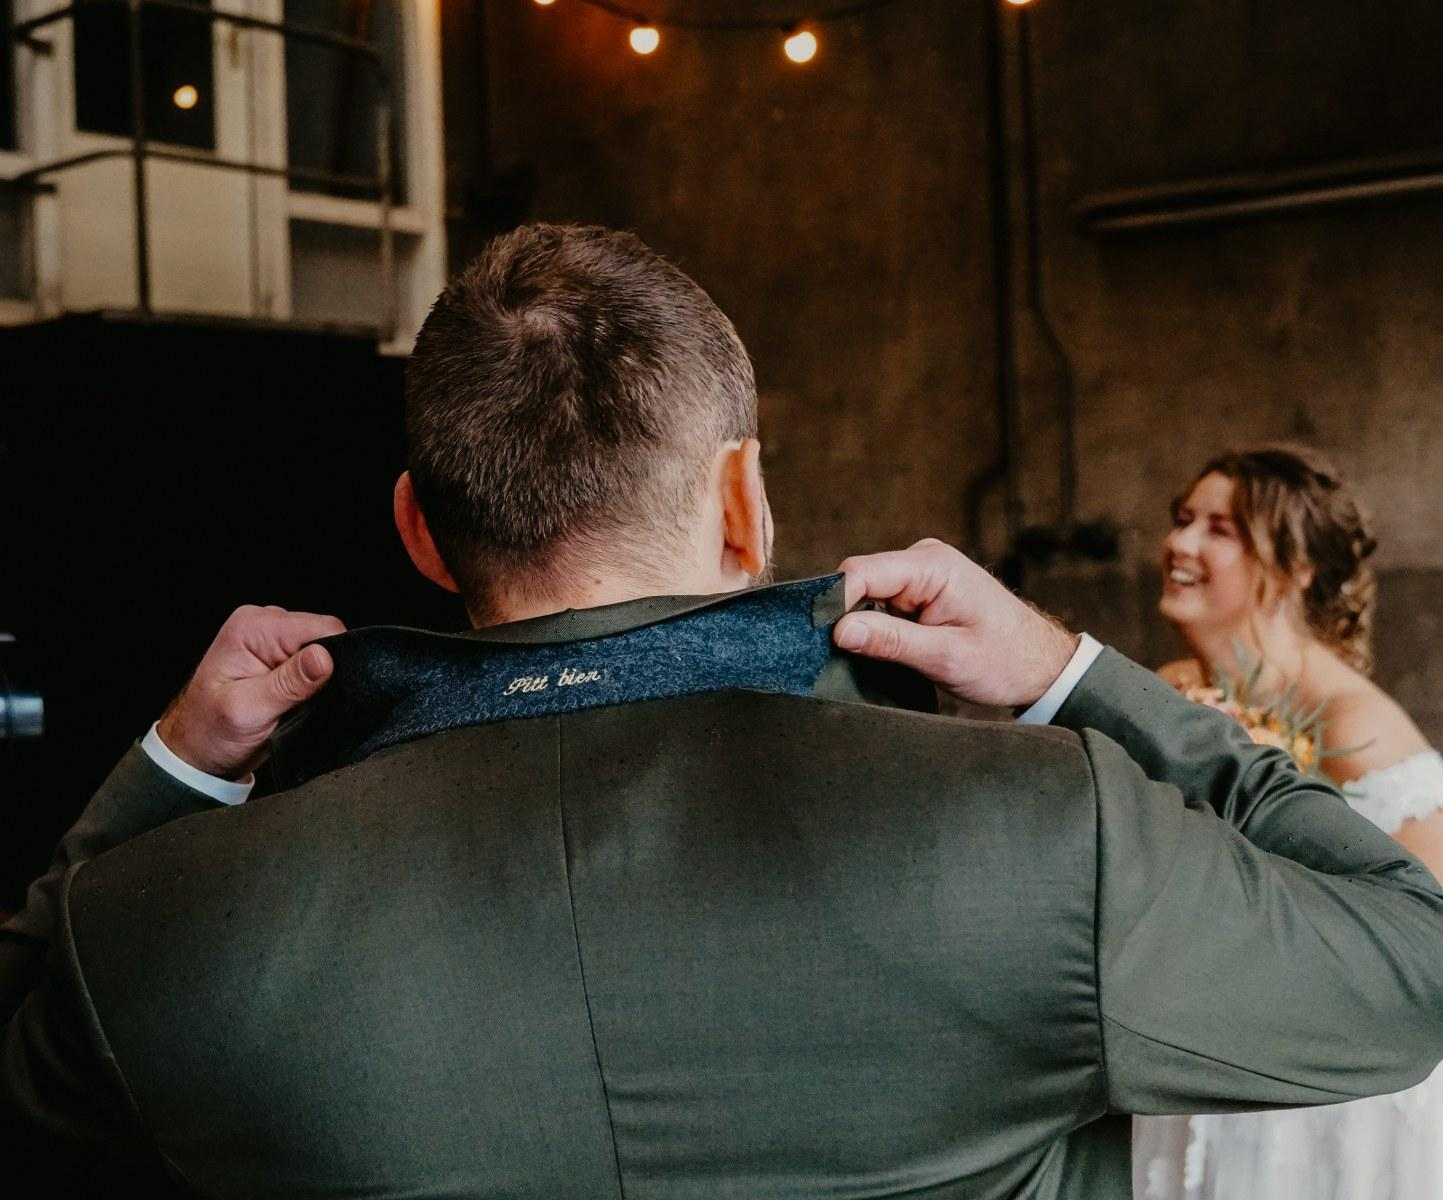 Groen trouwpak met anderskleurige gilet en details